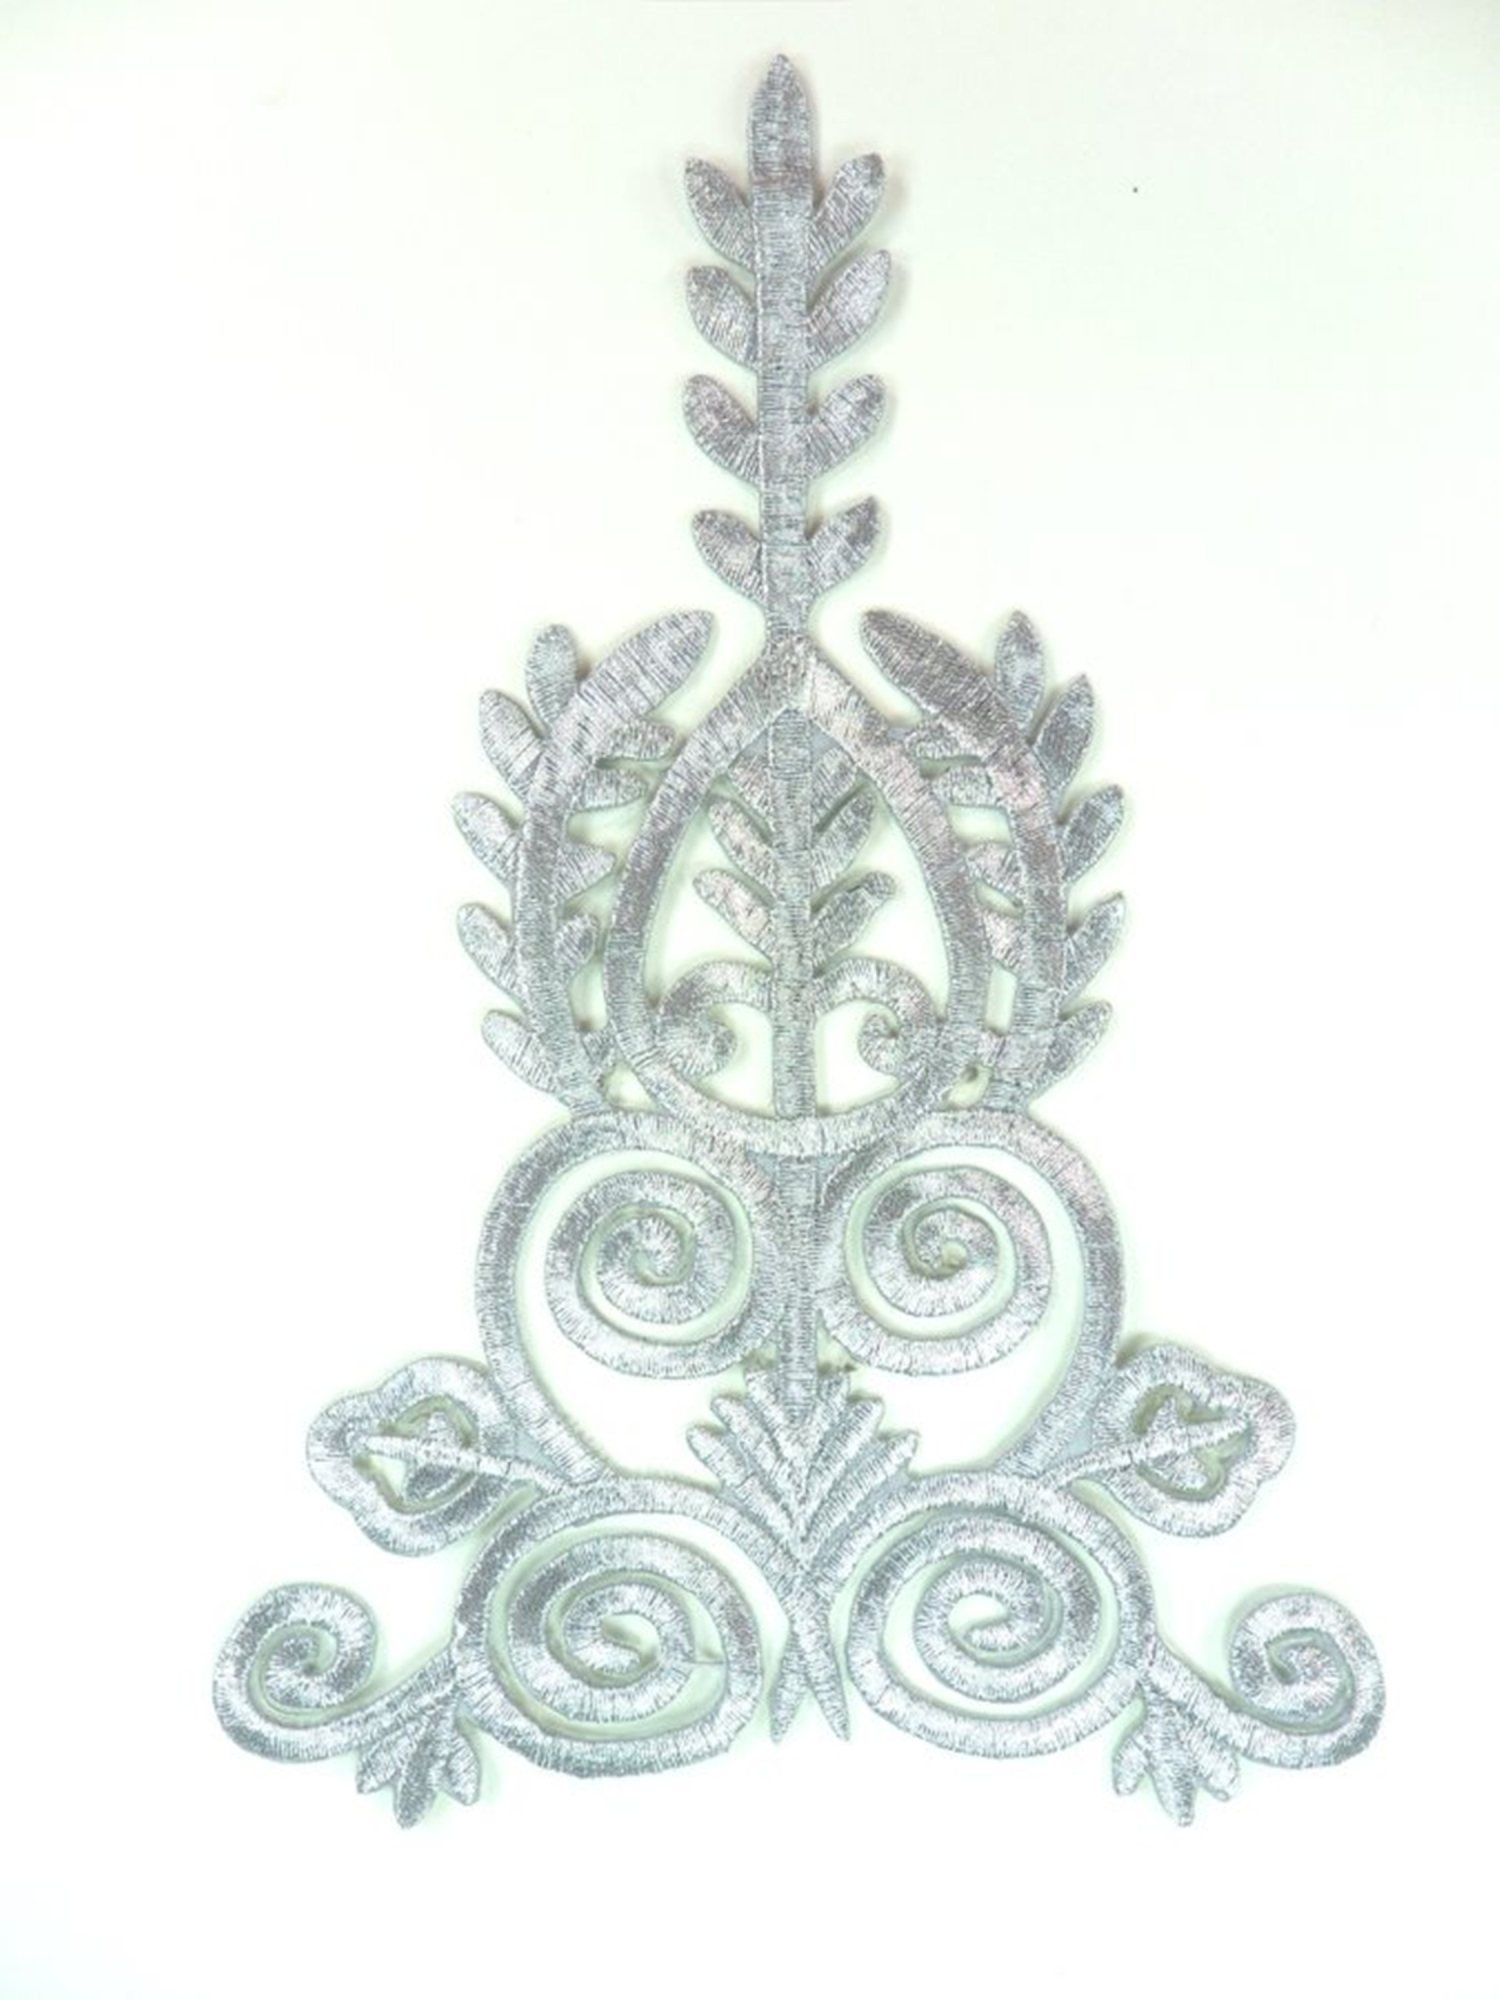 "Silver Embroidered Applique Metallic Designer Scroll Motif 7.5"" GB907"